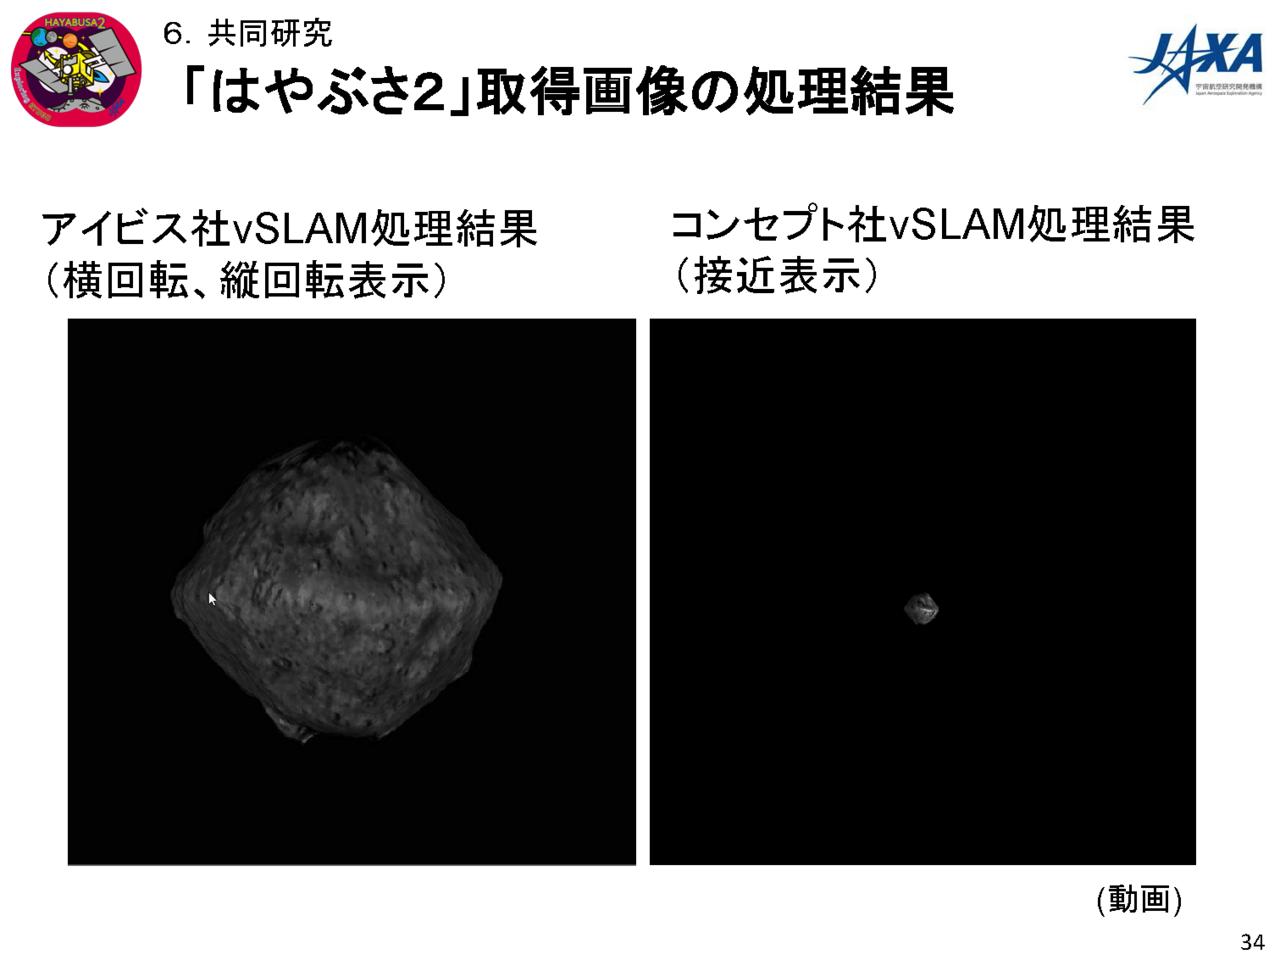 f:id:Imamura:20180802145954p:plain